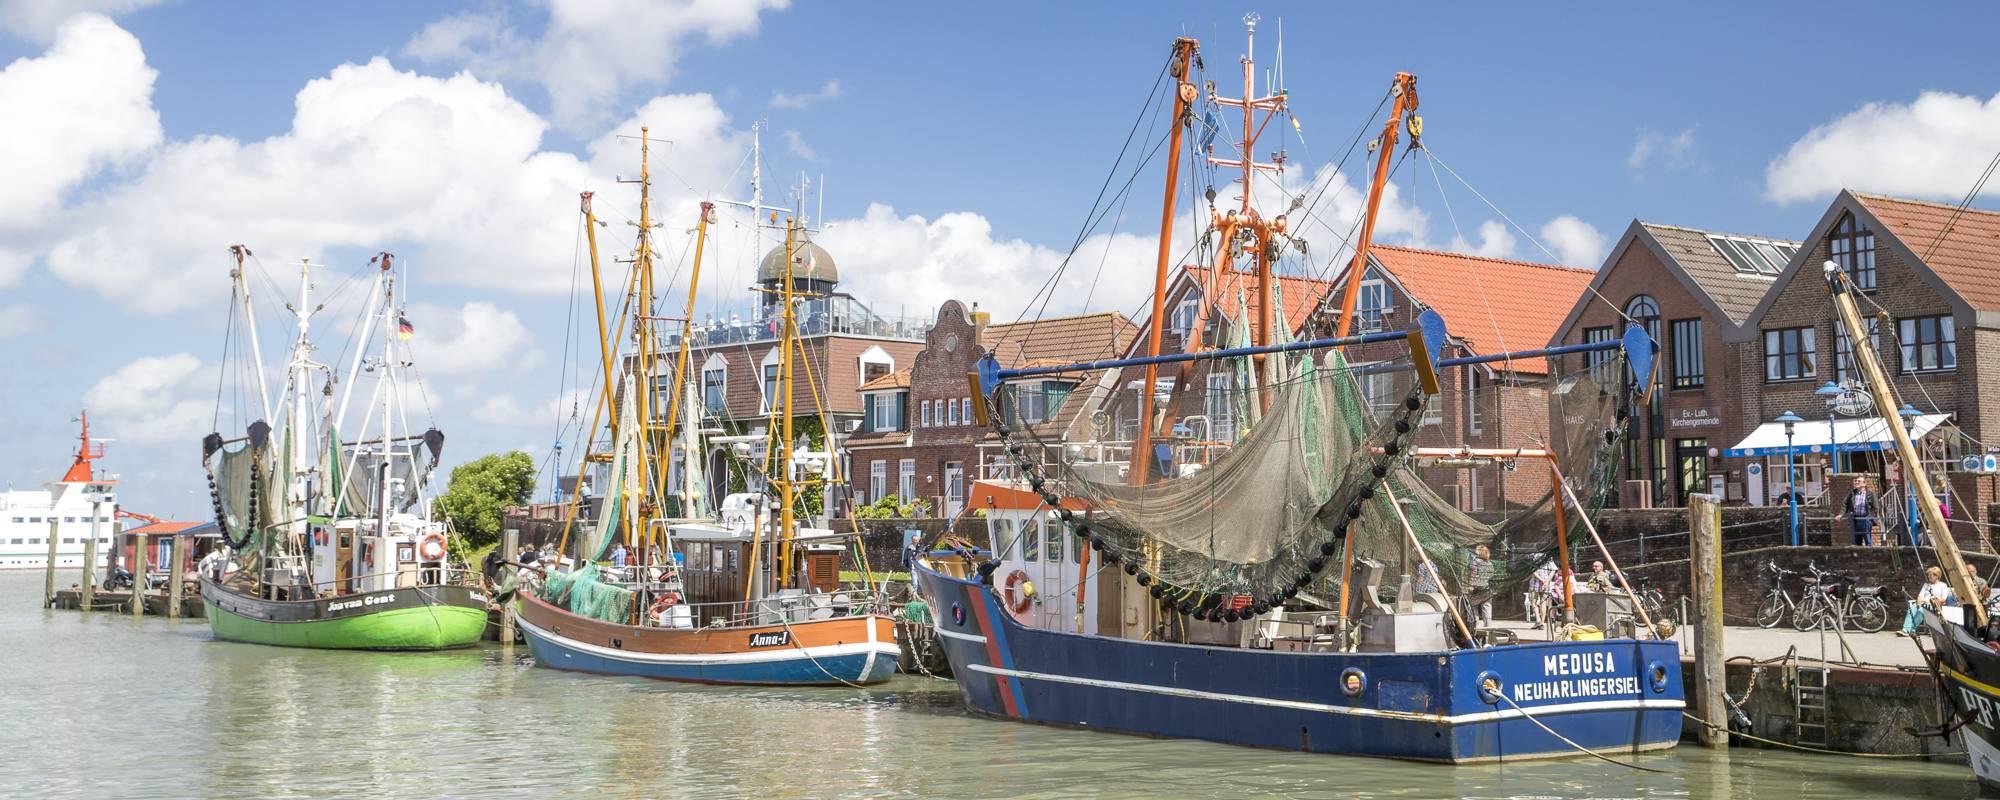 Kutterhafen Neuharlingersiel - Krabbenkutter Medusa, Anna I und Jan van Gent